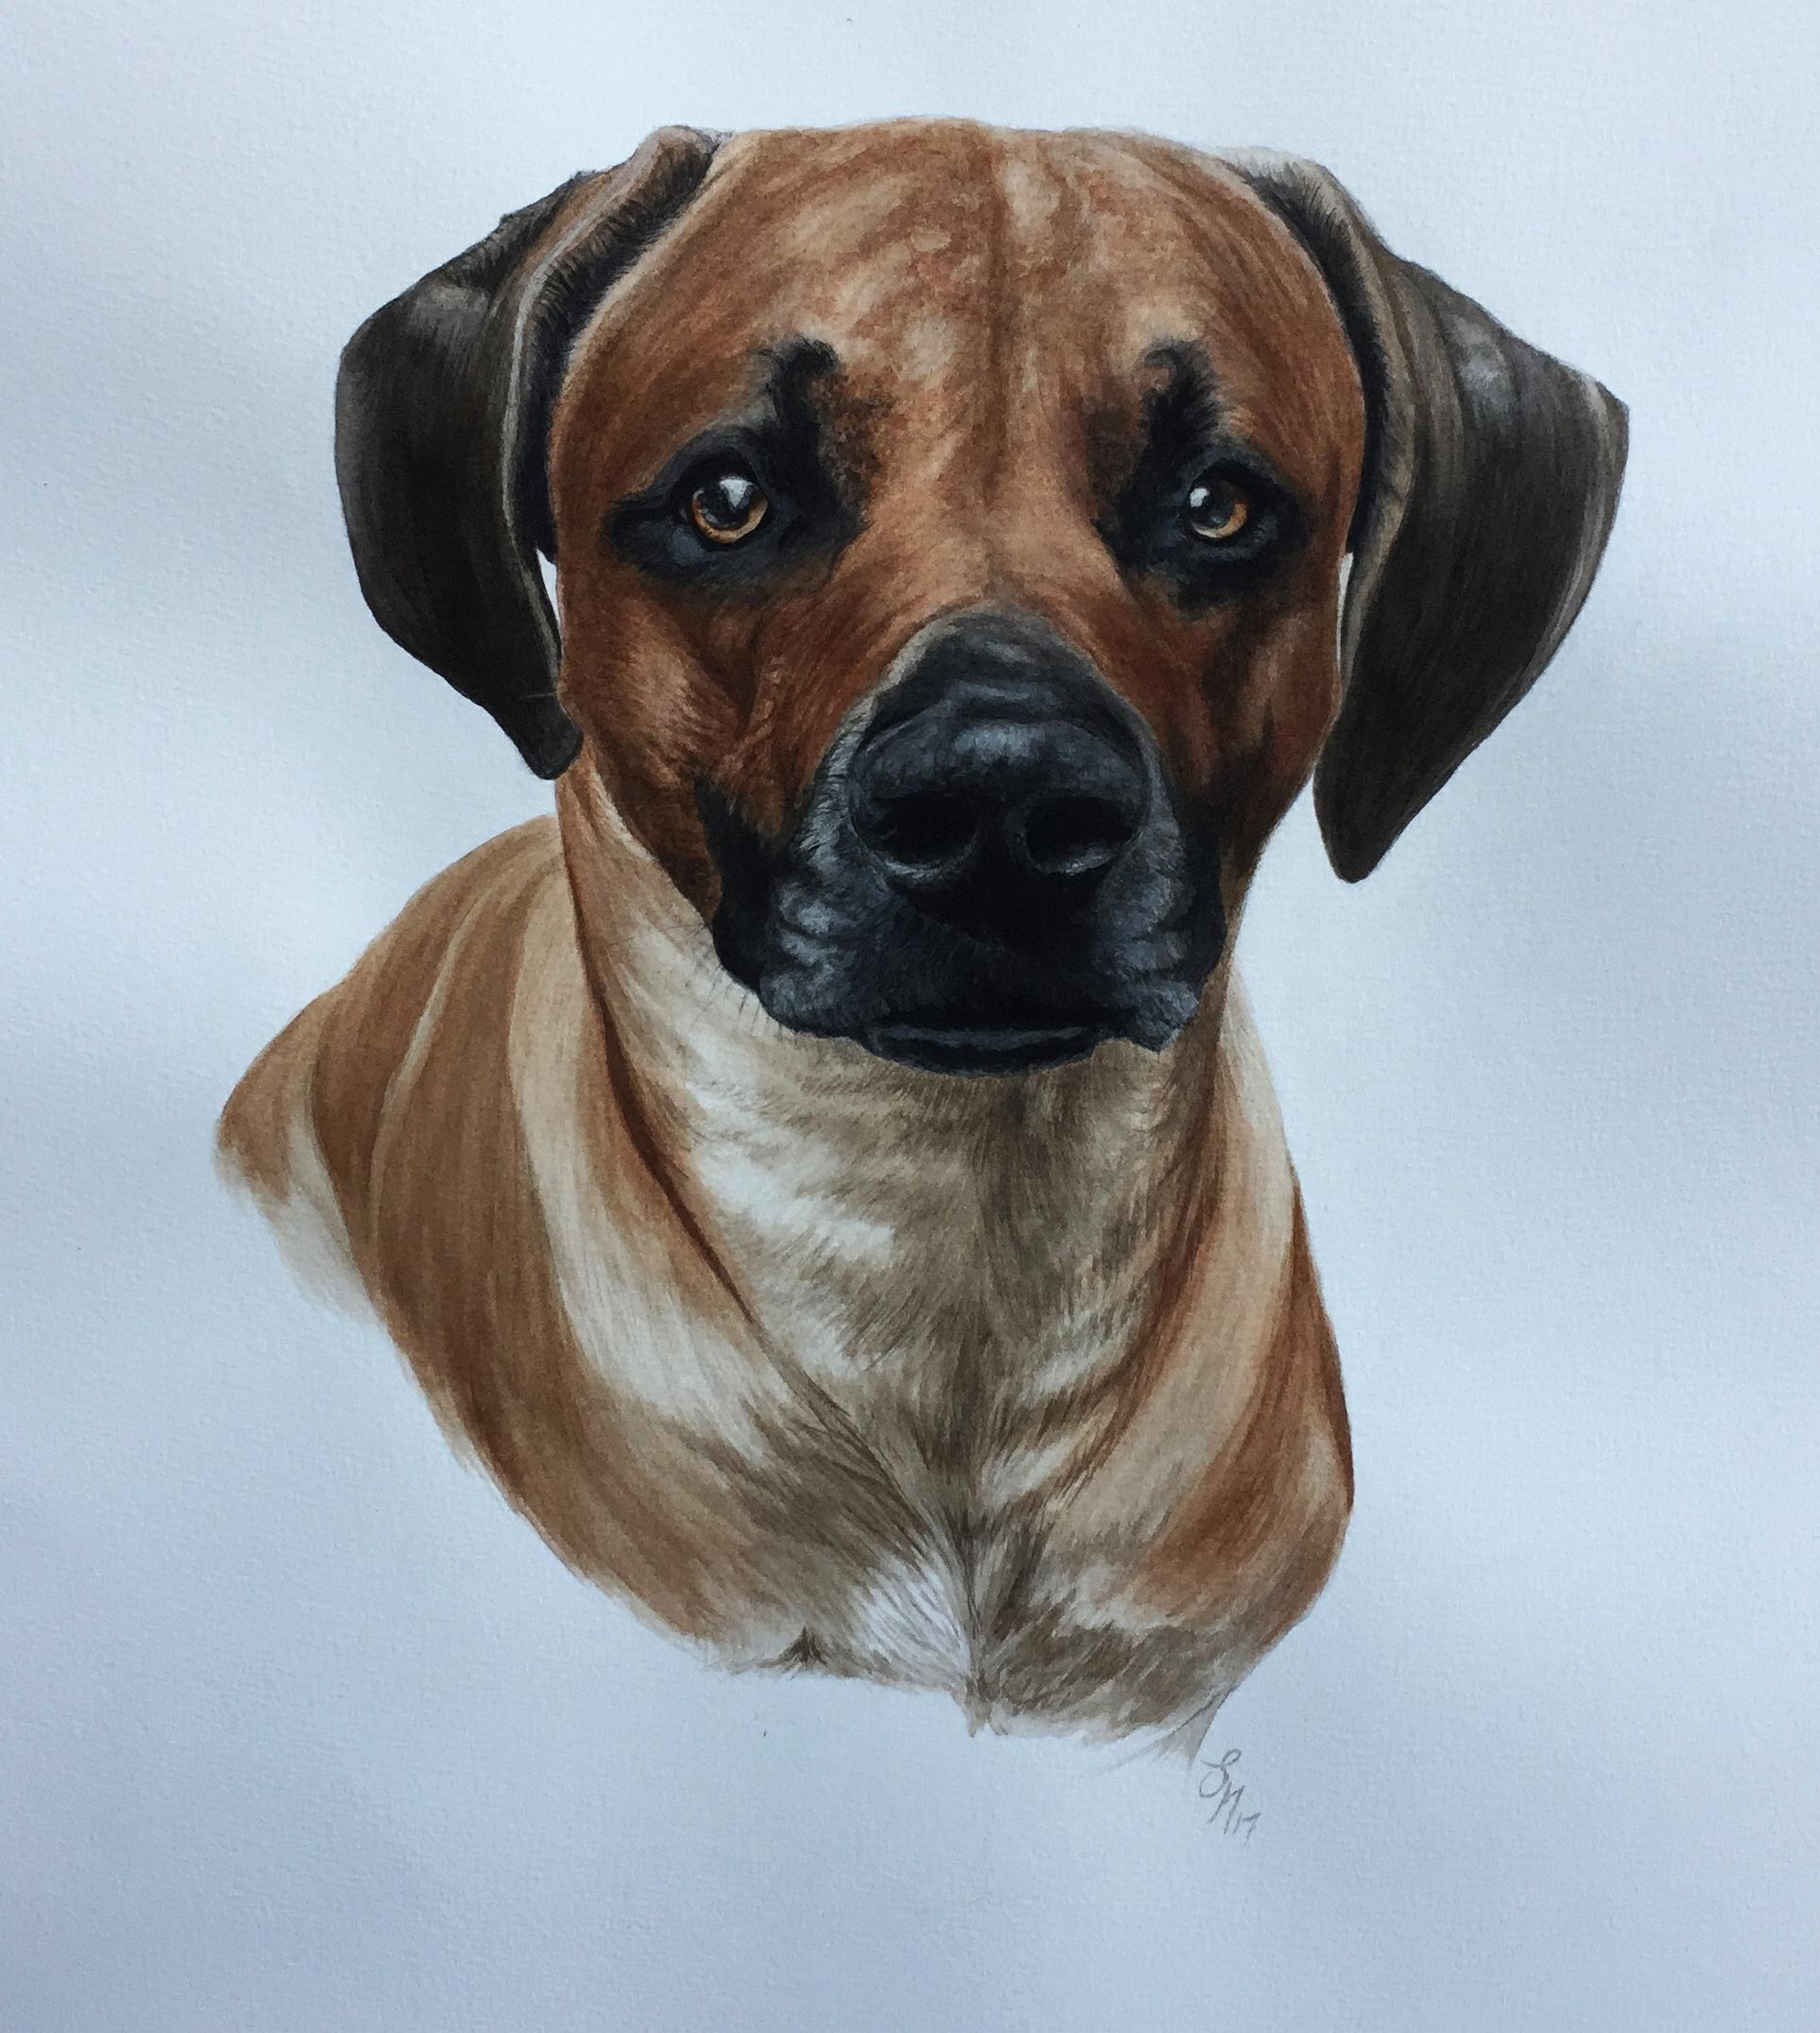 Pet, animal, portrait, painting, watercolours, animal art,